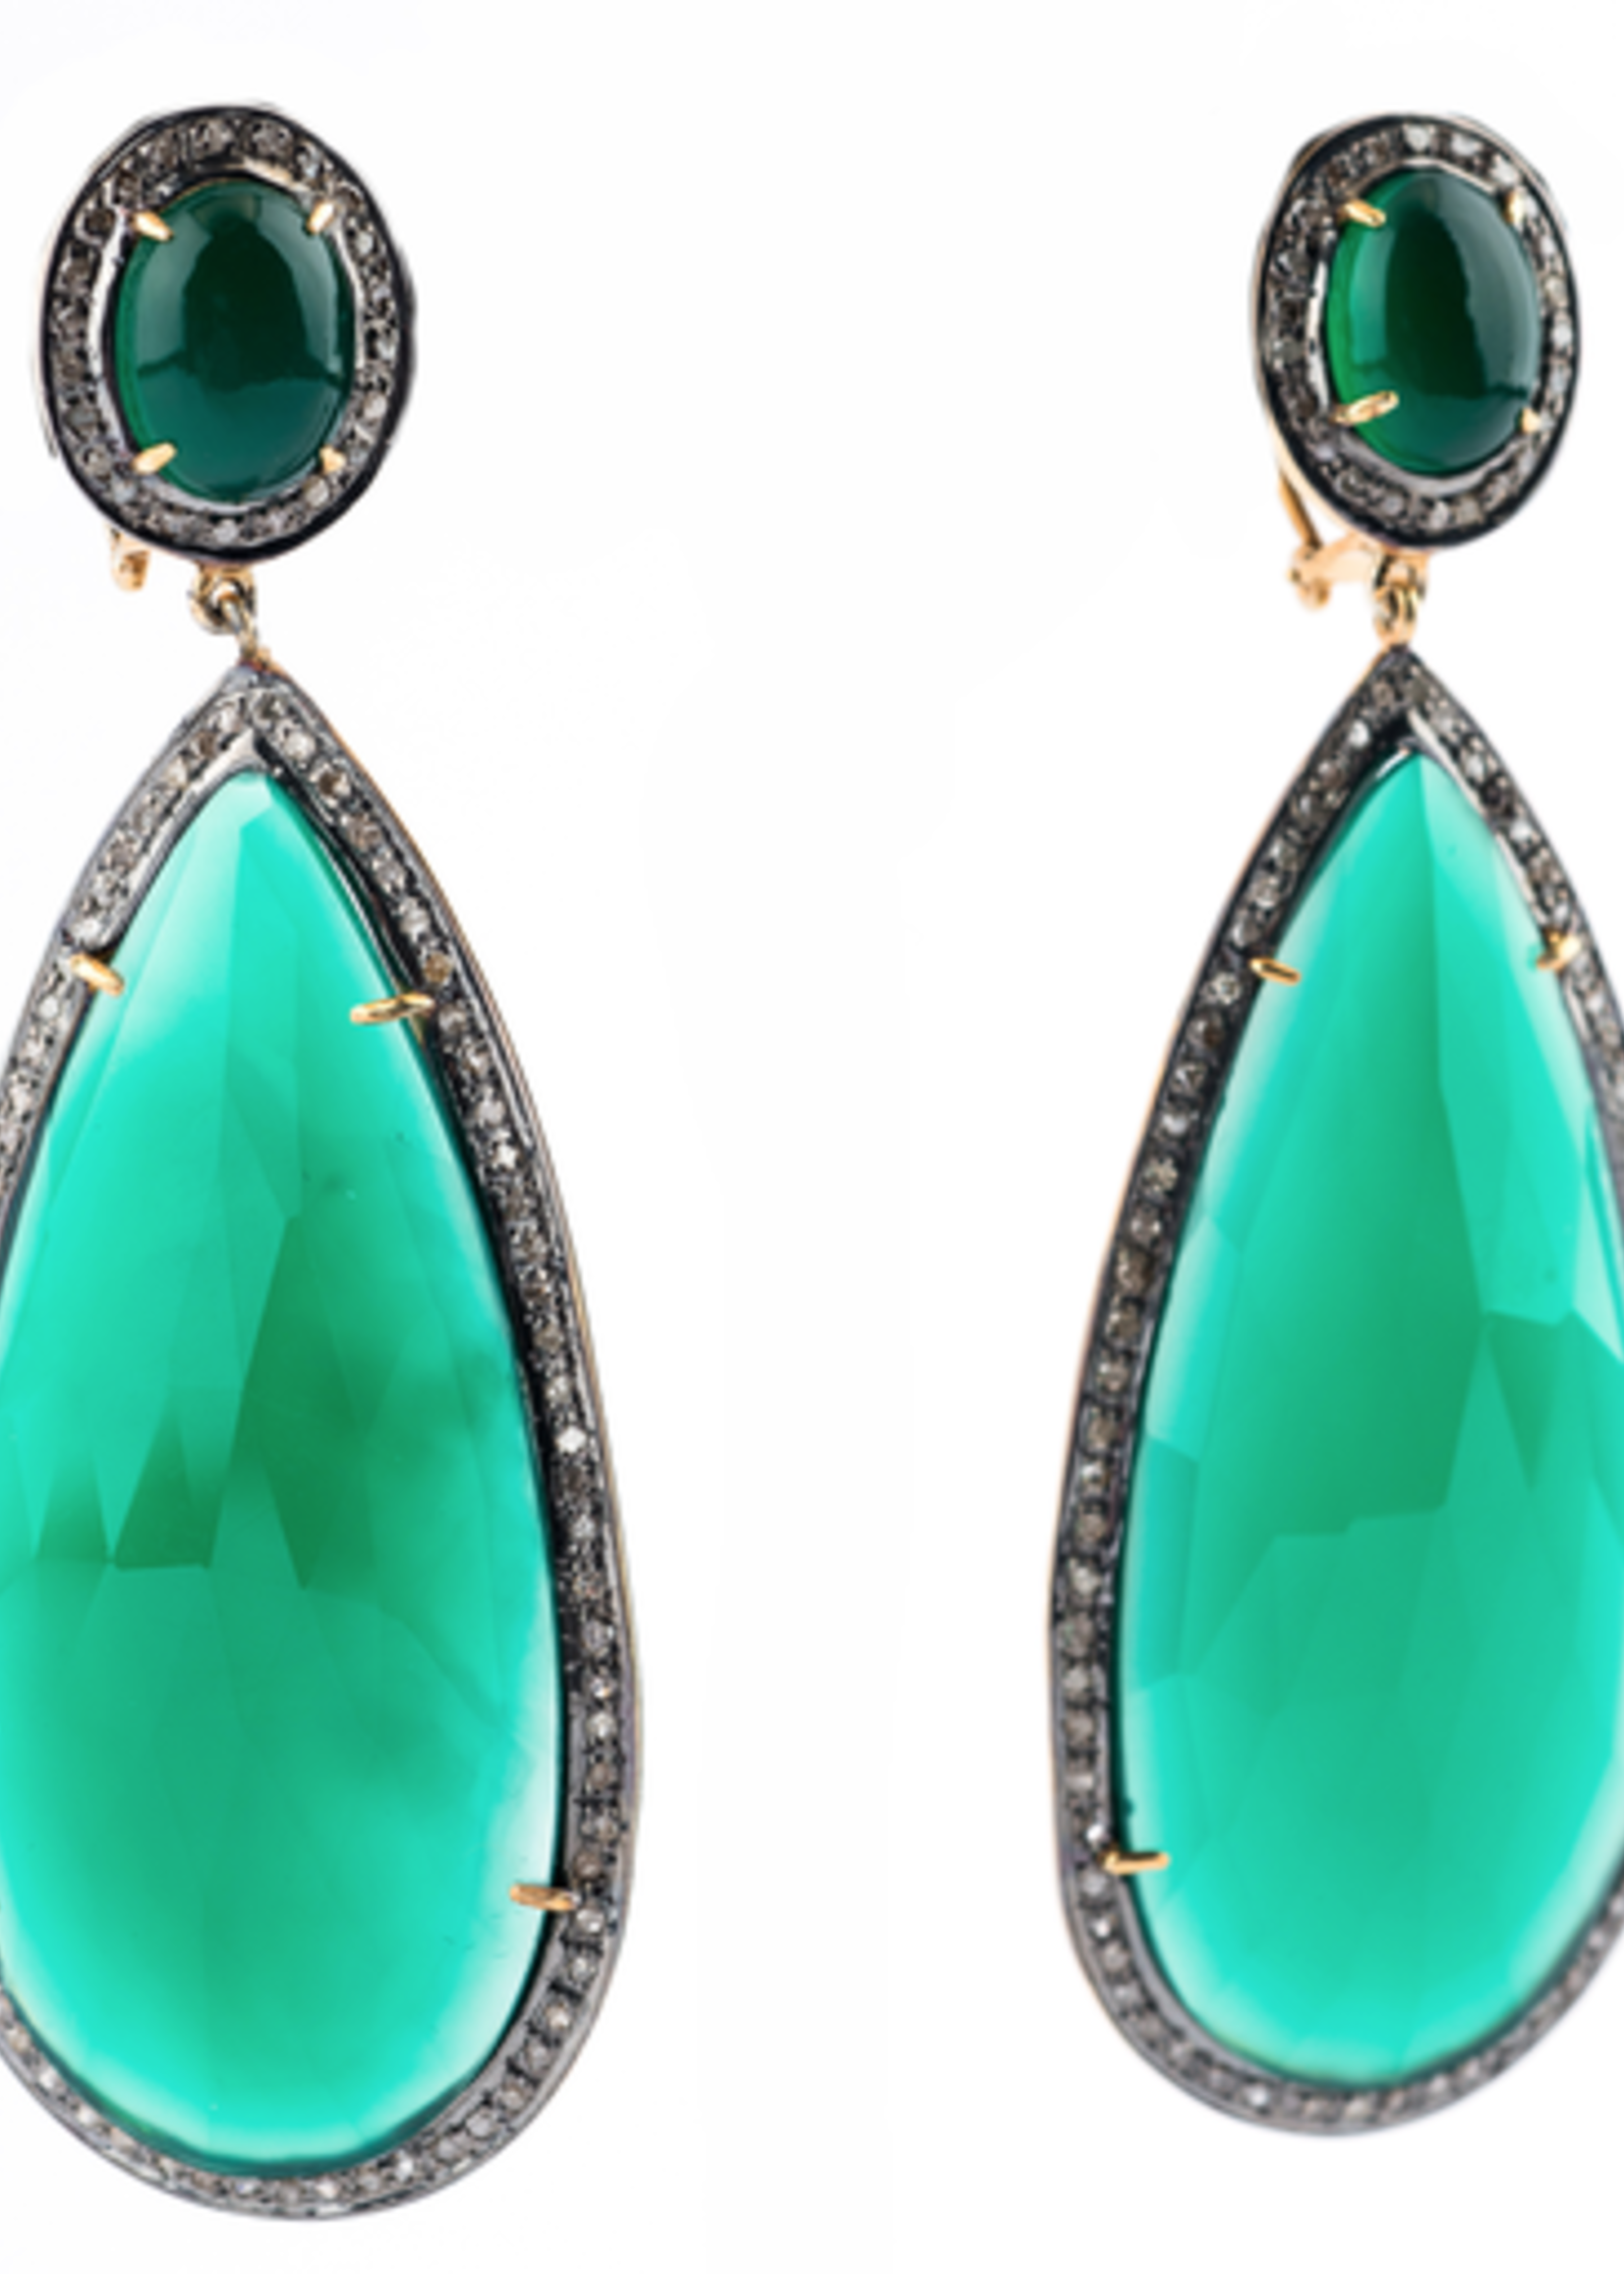 Mina Danielle Green Onyx and Diamond Pear Earrings